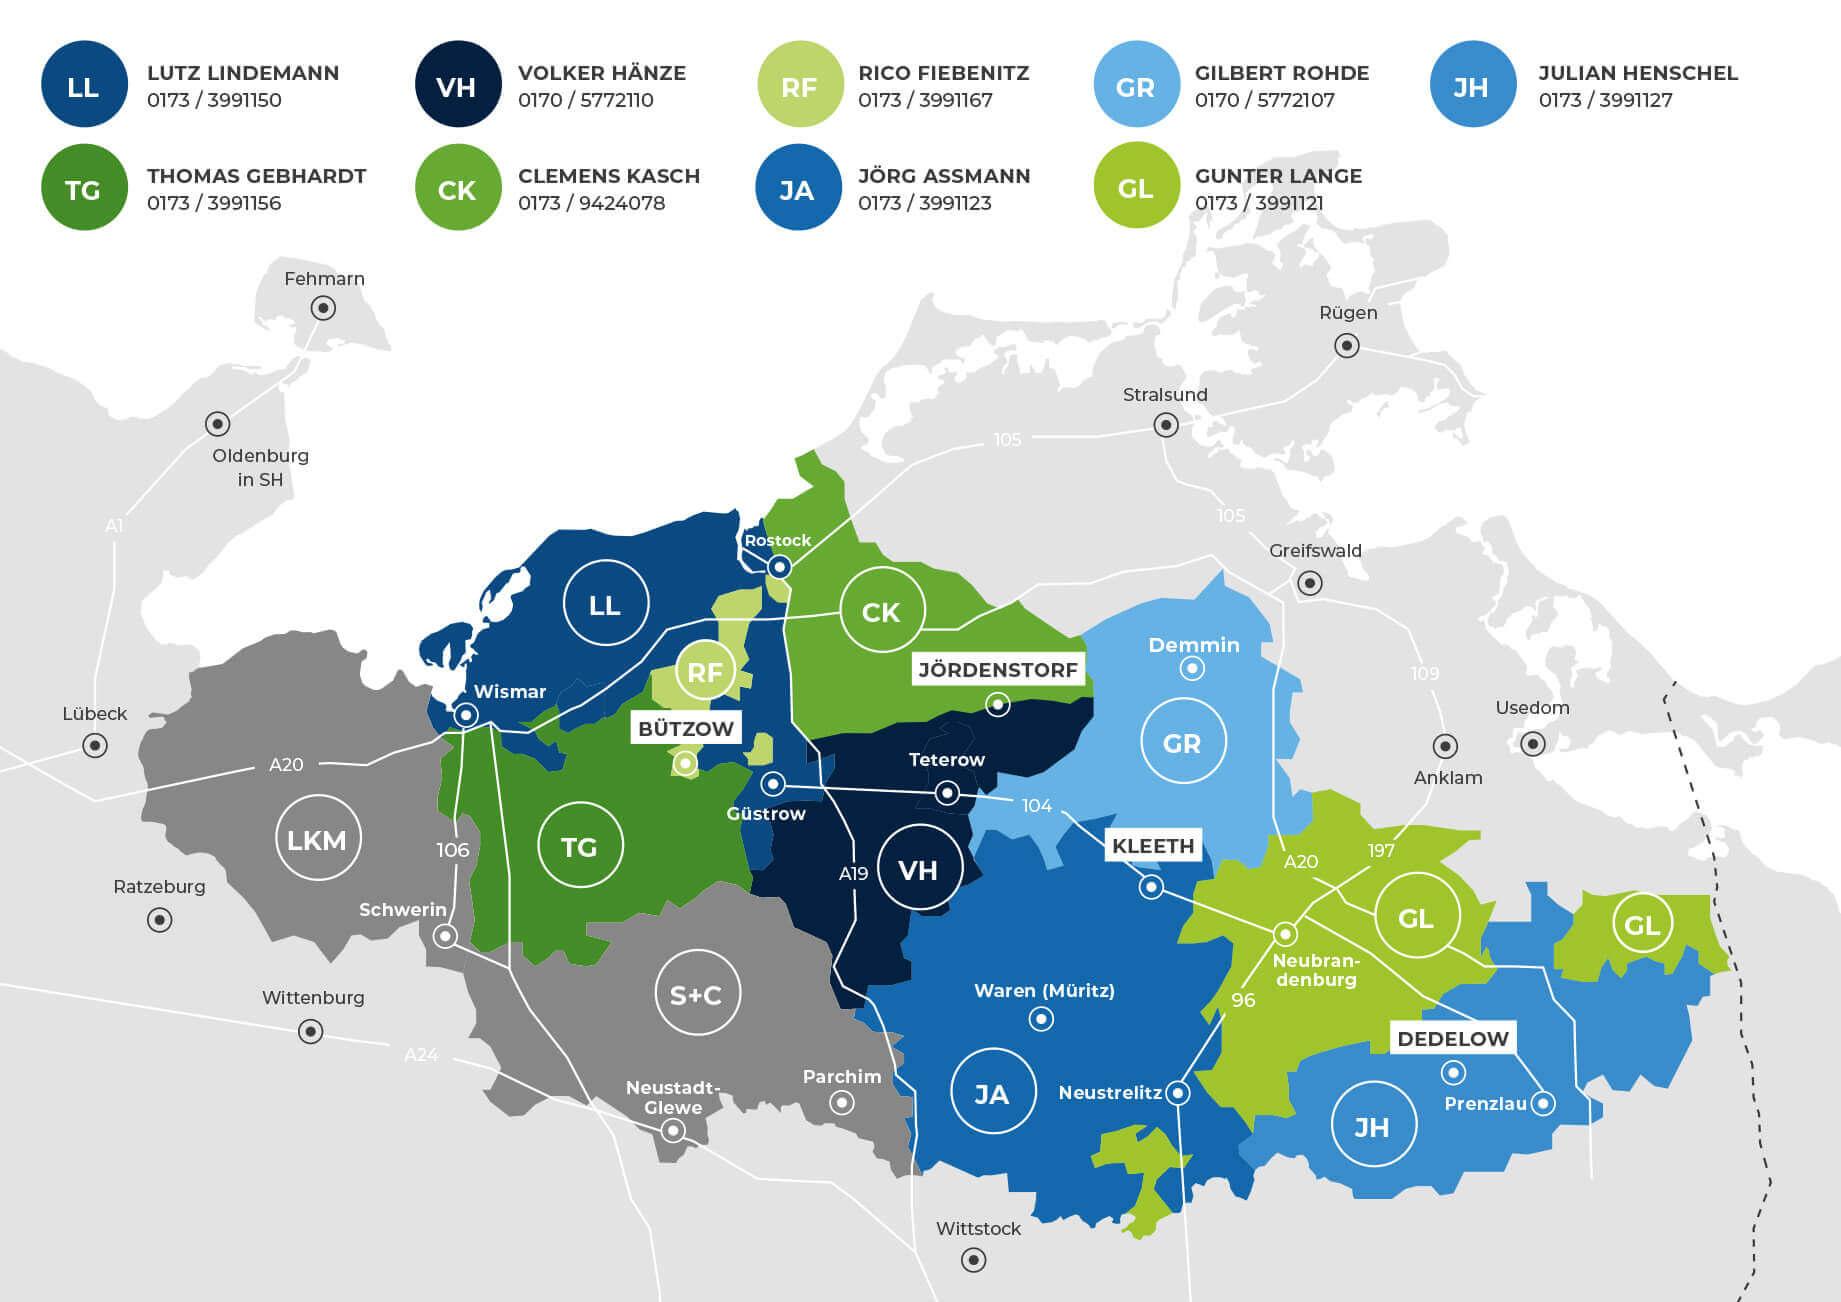 Landtechnik Geschaftsgebiet-Mecklenburg-Vorpommern